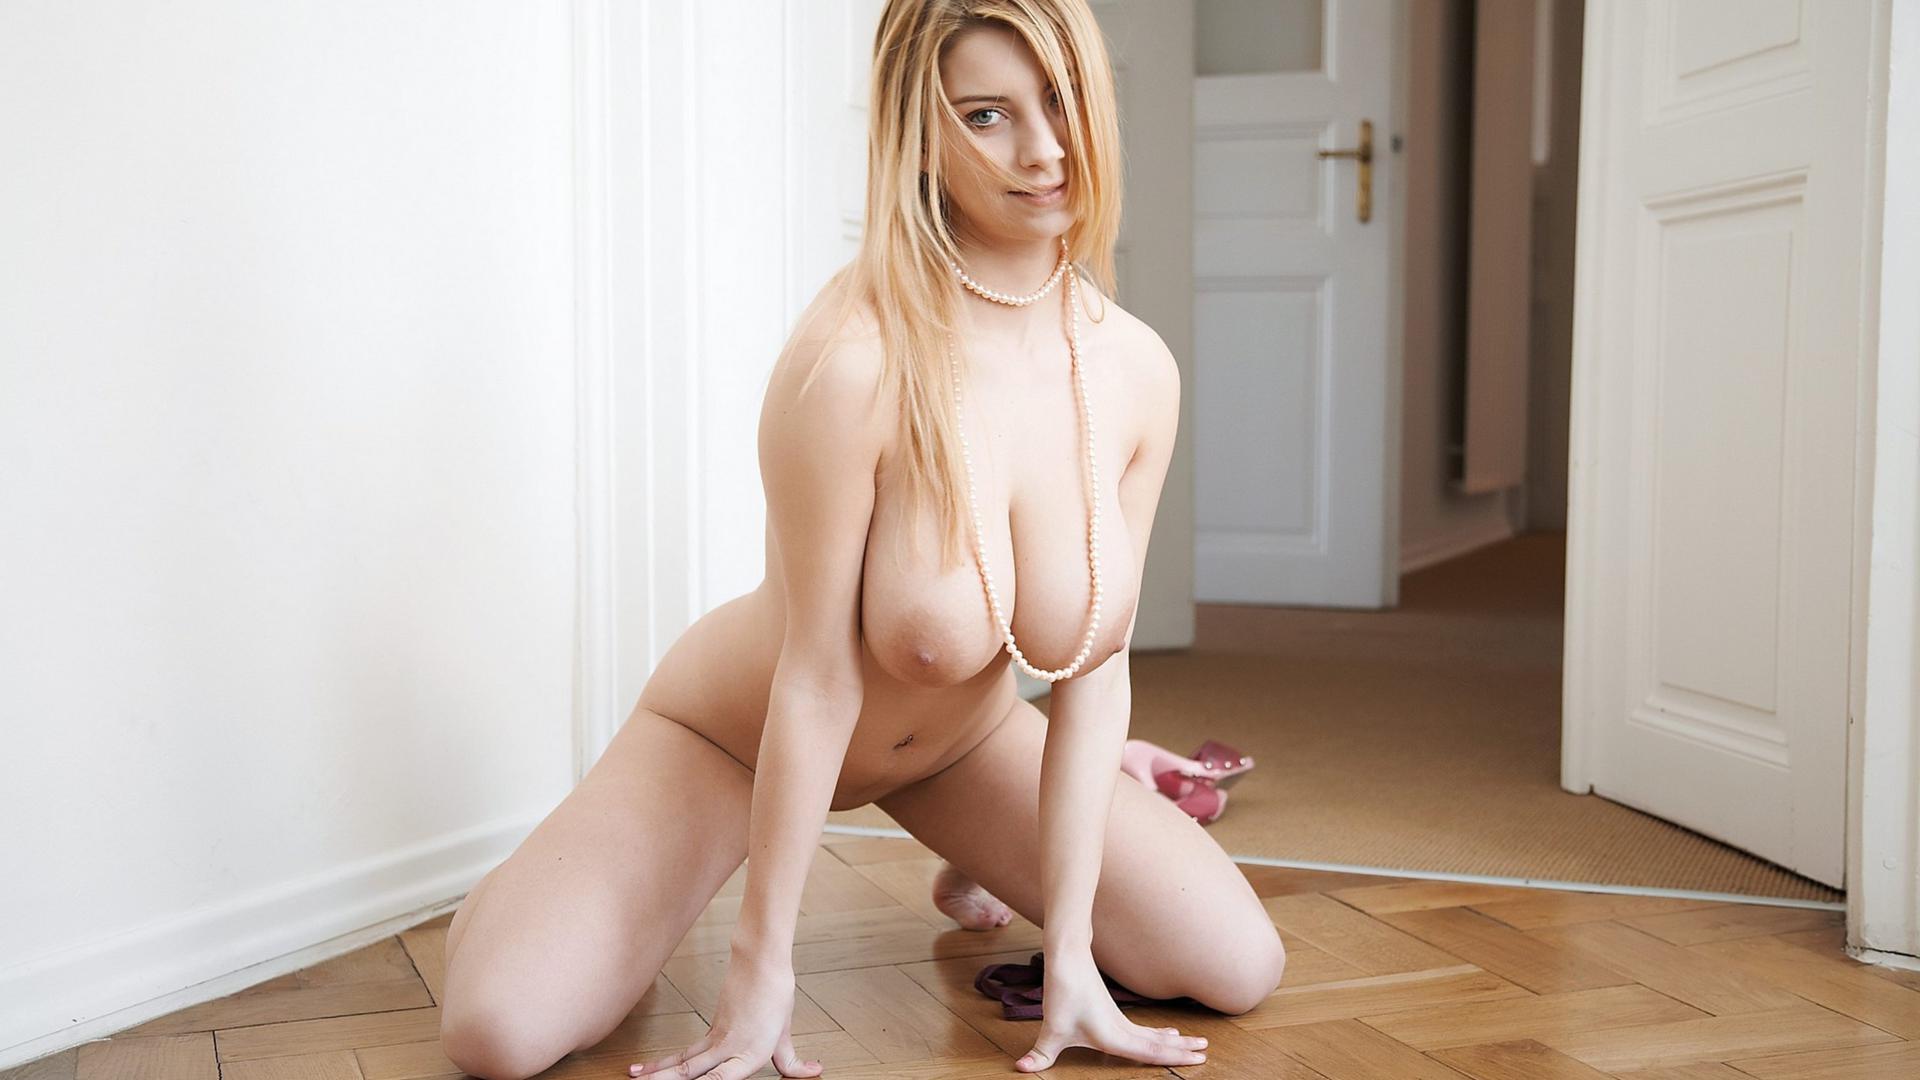 Download photo 1920x1080, cathy, blonde, nude, cutie, sexy ...